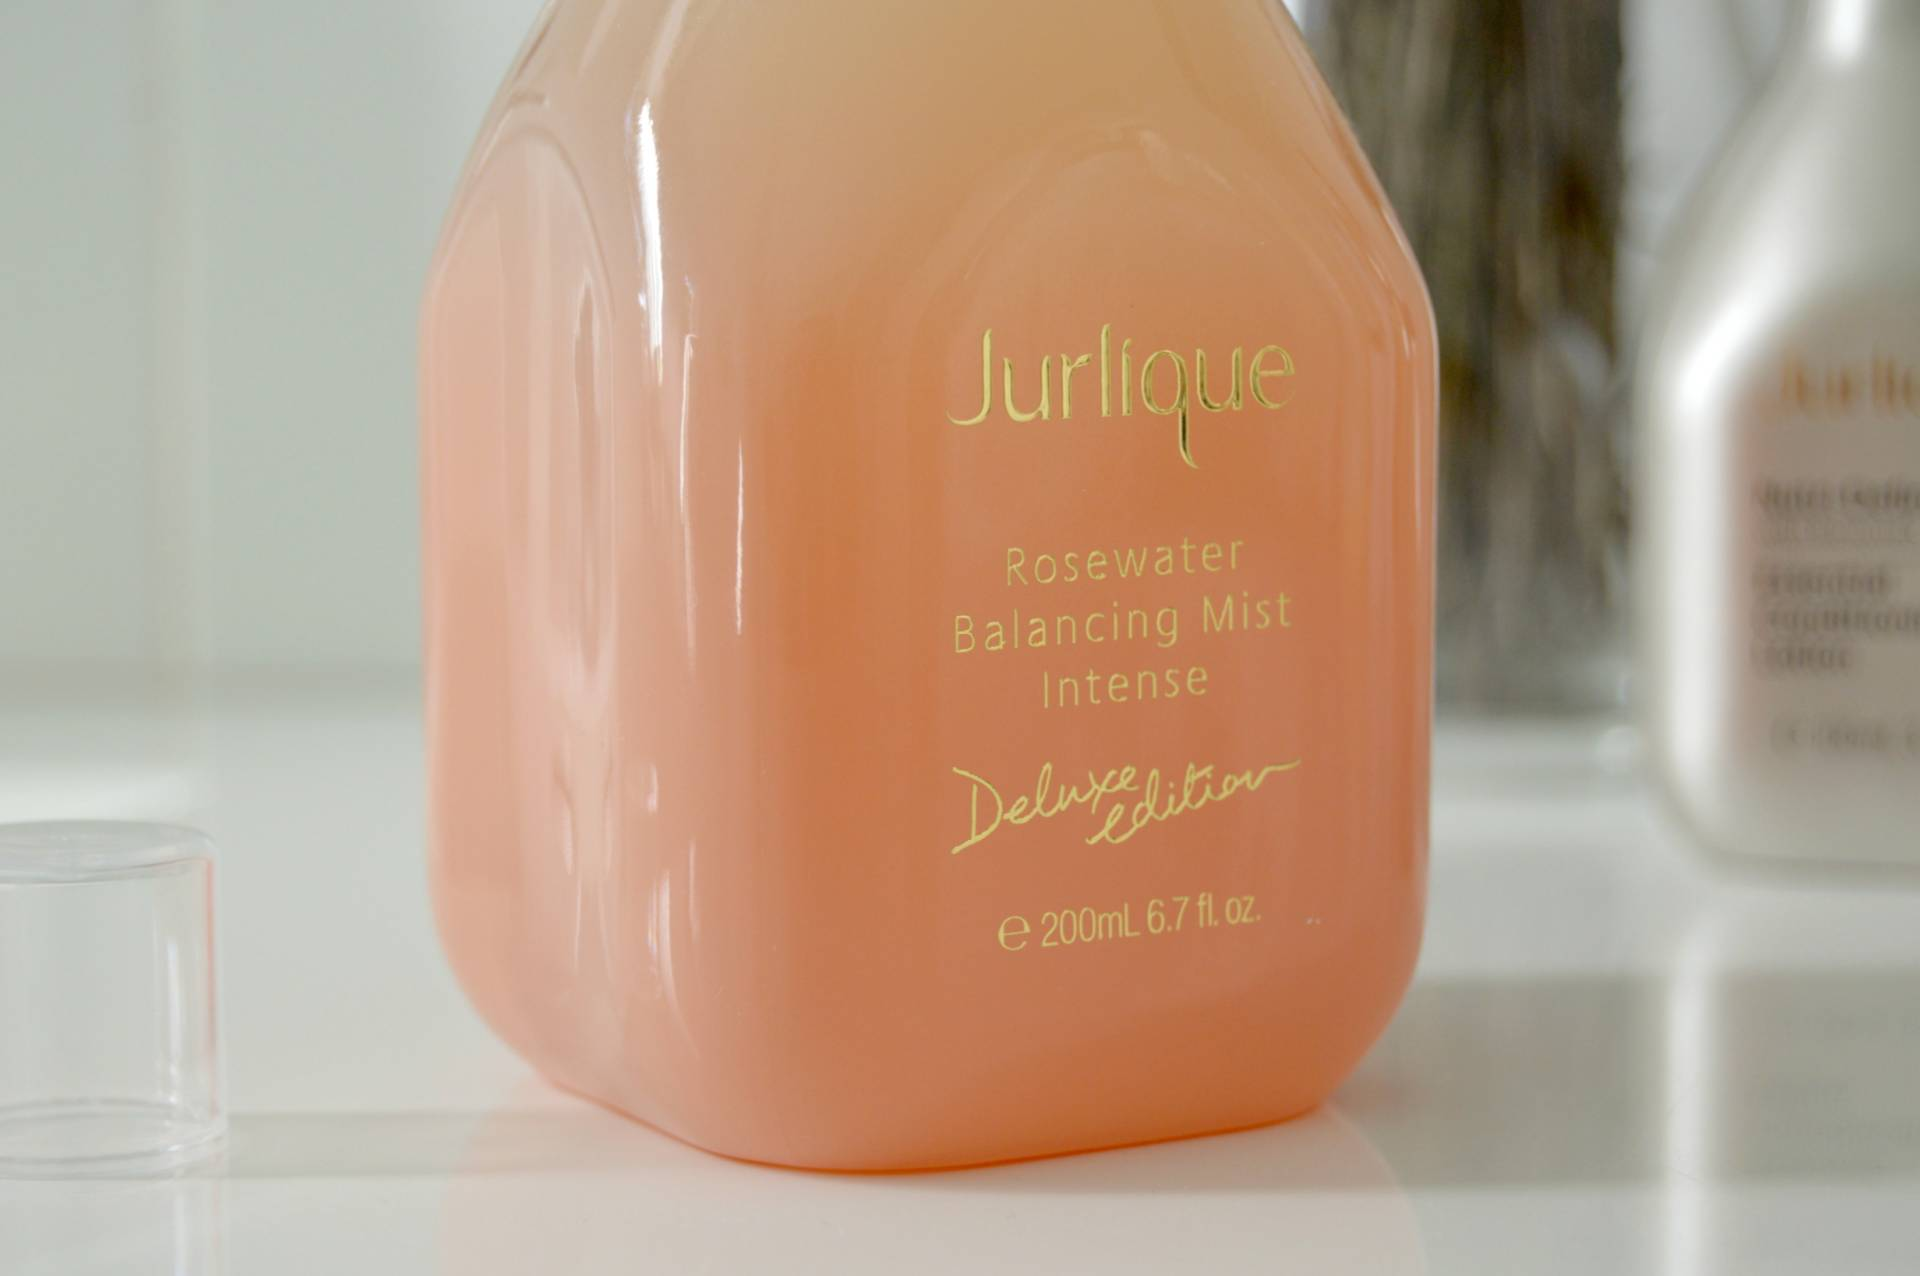 jurlique deluxe edition rosewater balancing mist intense inhautepursuit review